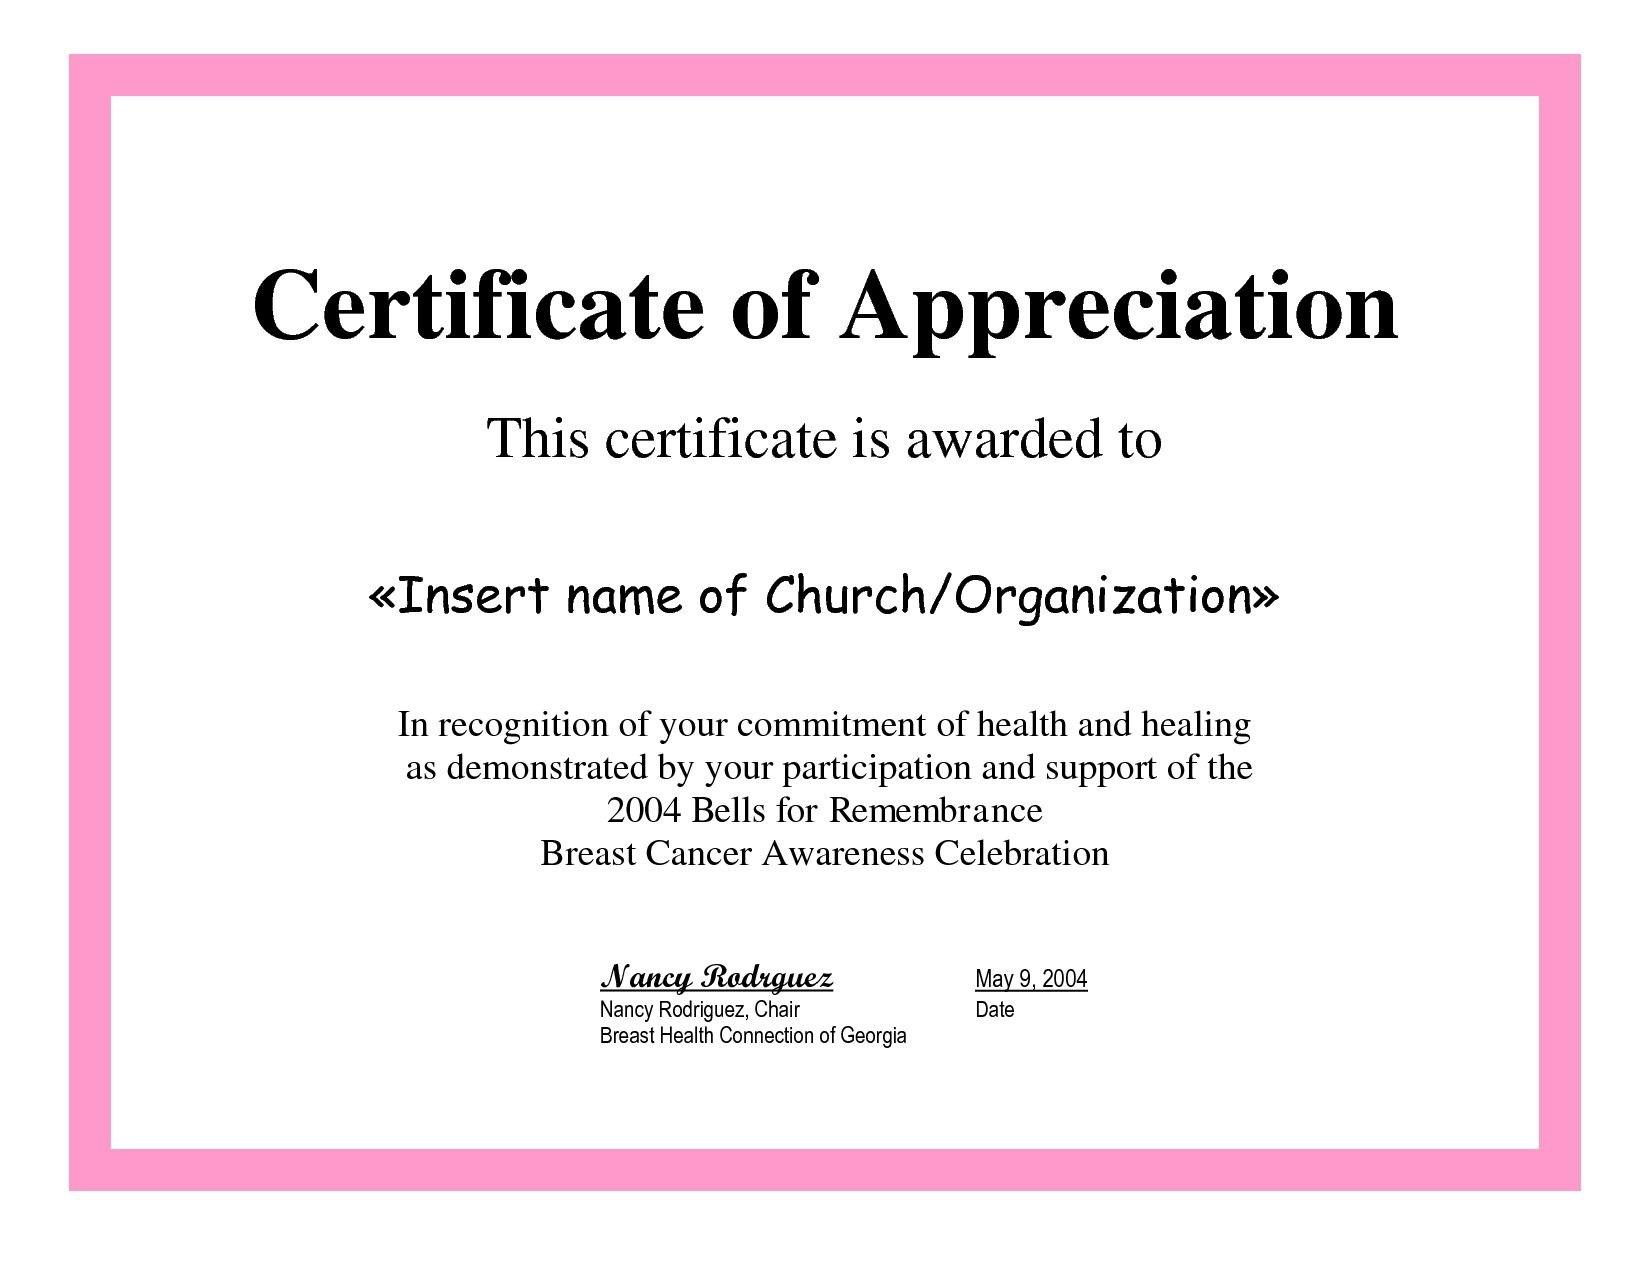 Employee Appreciation Certificate Template Free Recognition For Army Certificate Of Appreciation Template